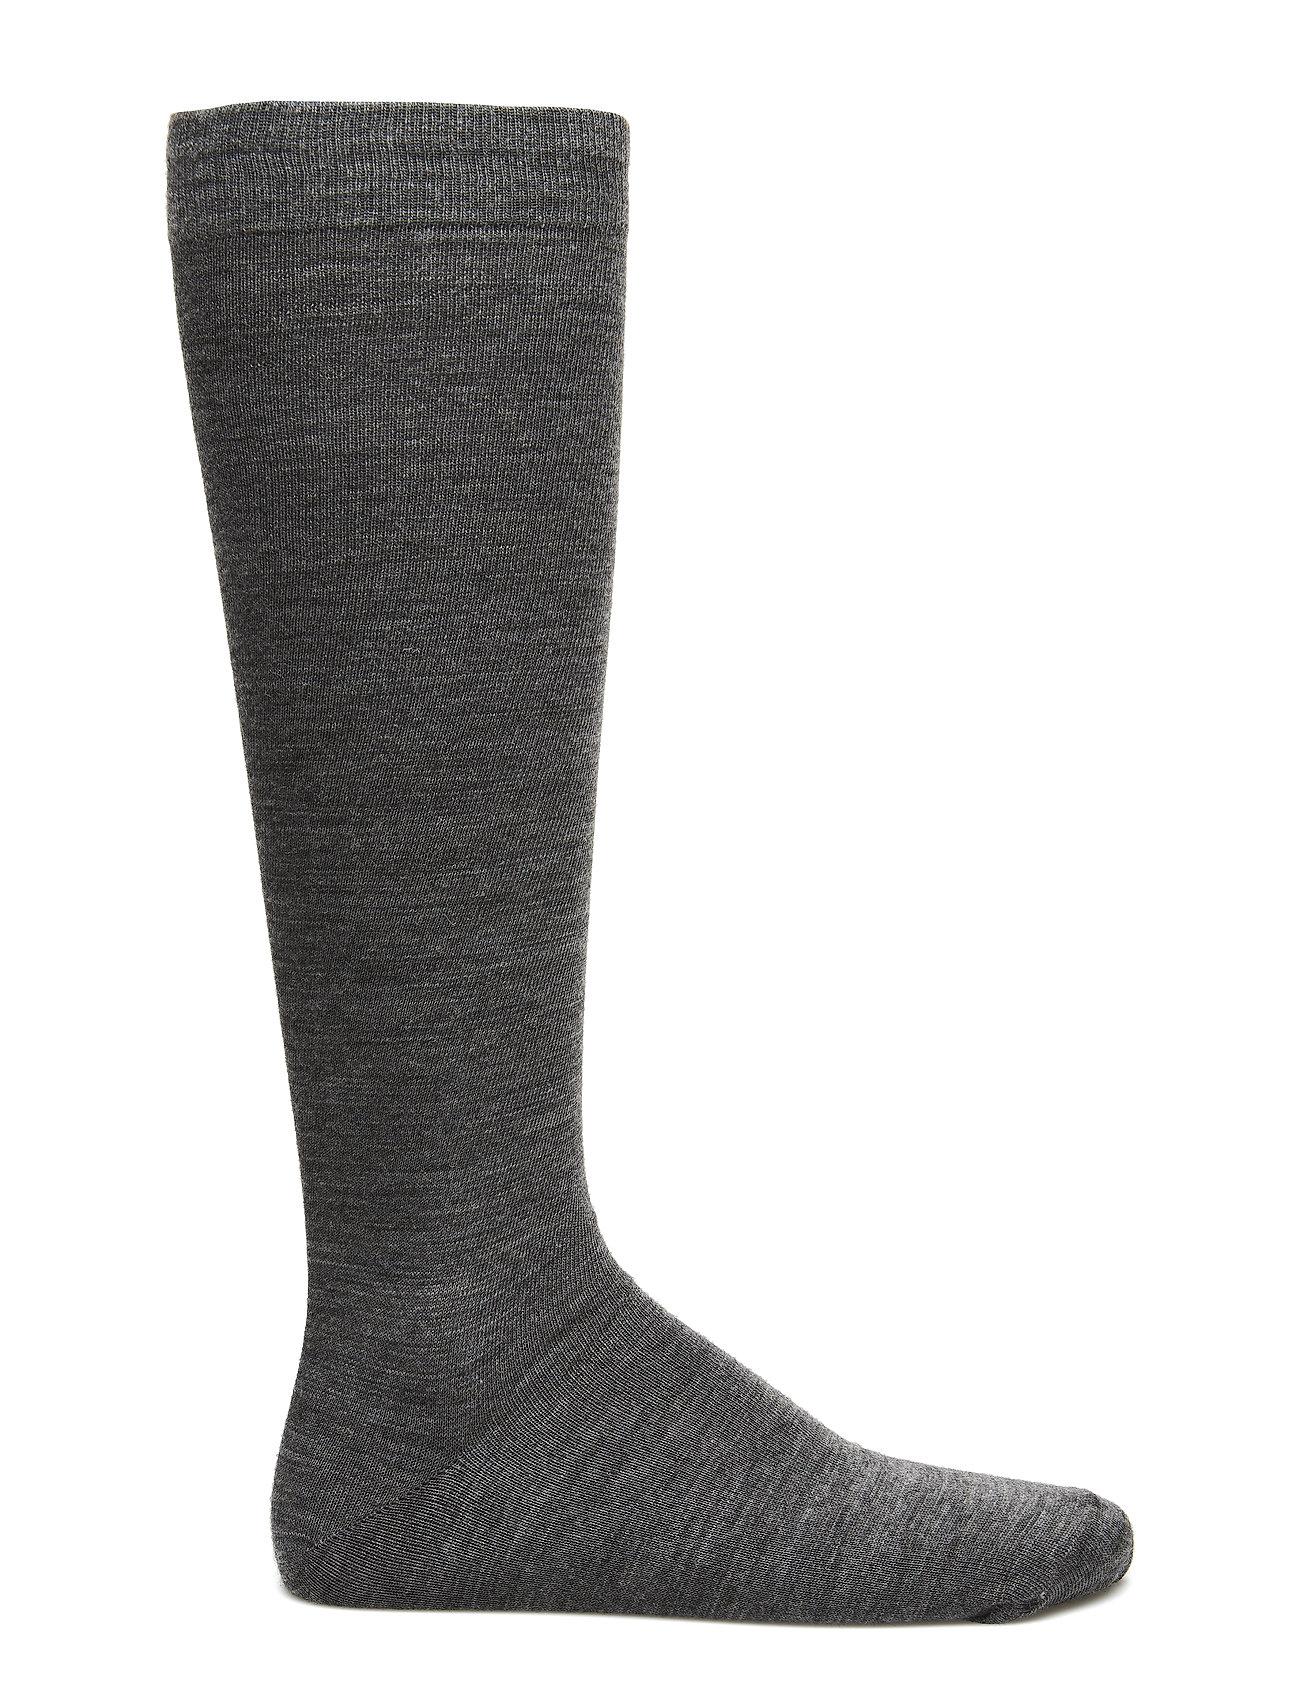 Kneehighgrey Egtved Egtved Socks Socks Twin Twin Mel Kneehighgrey MVzpqSU